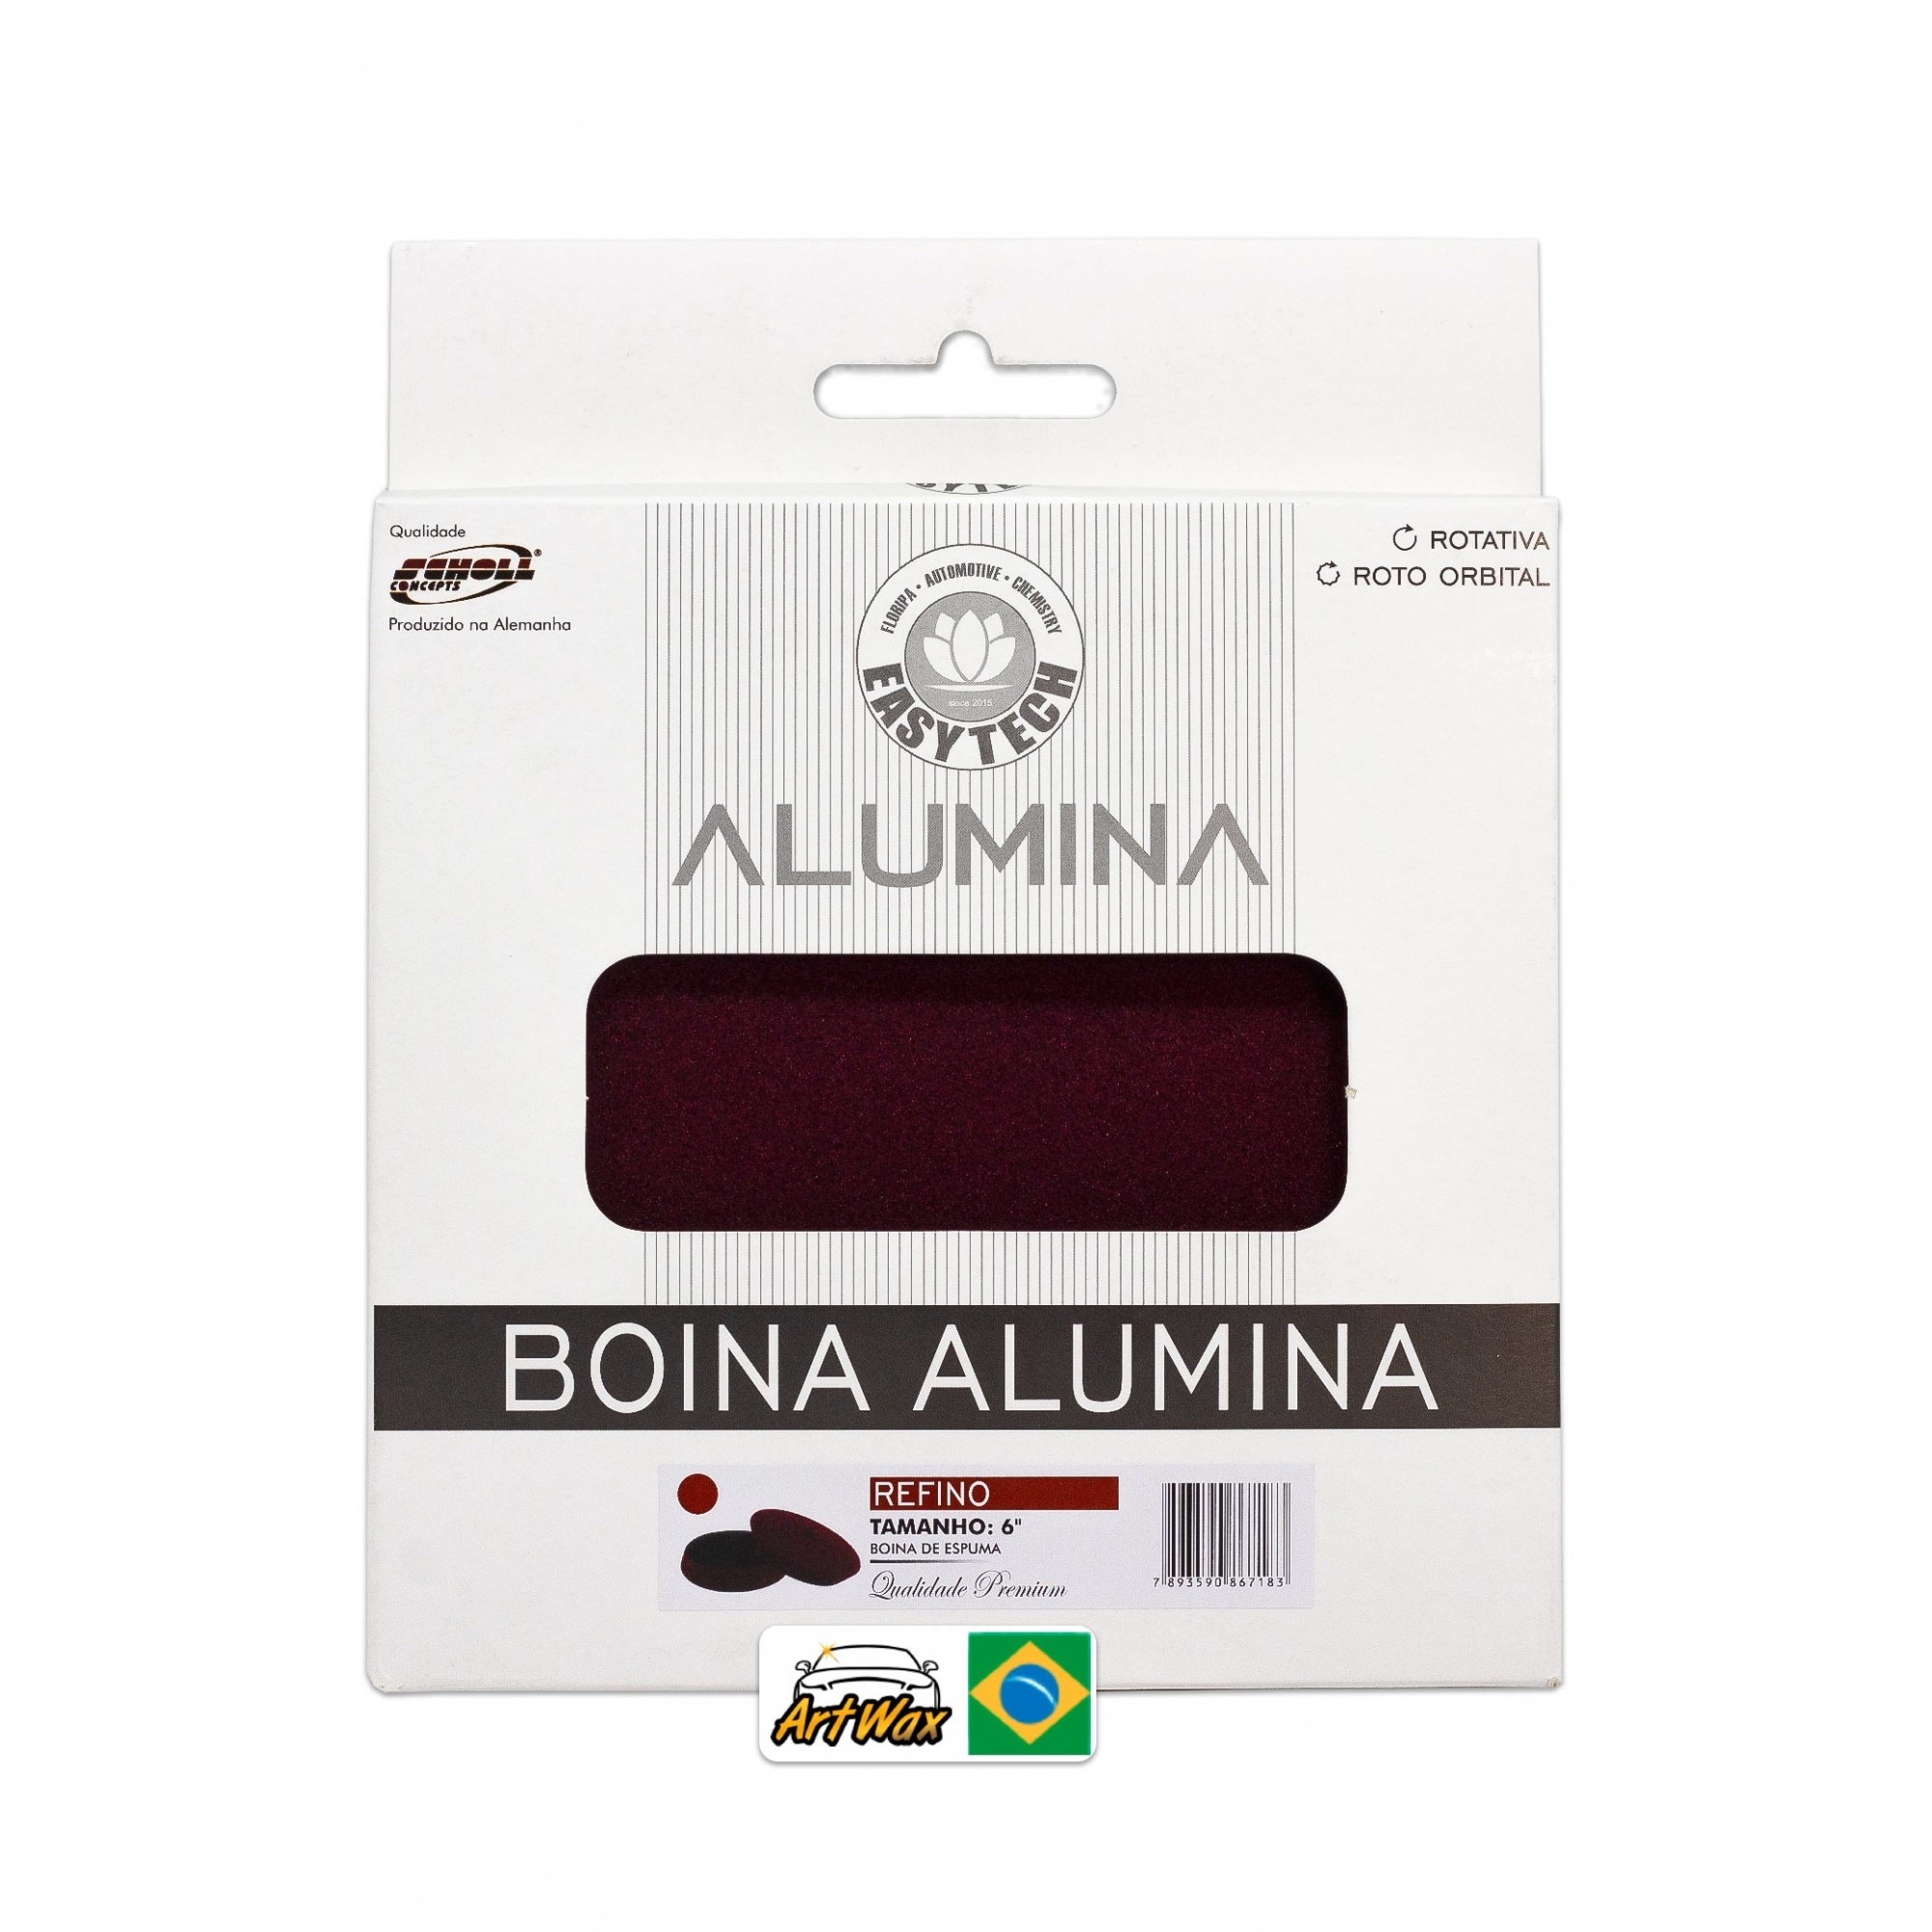 Easytech Boina Alumina Refino 165mm 6